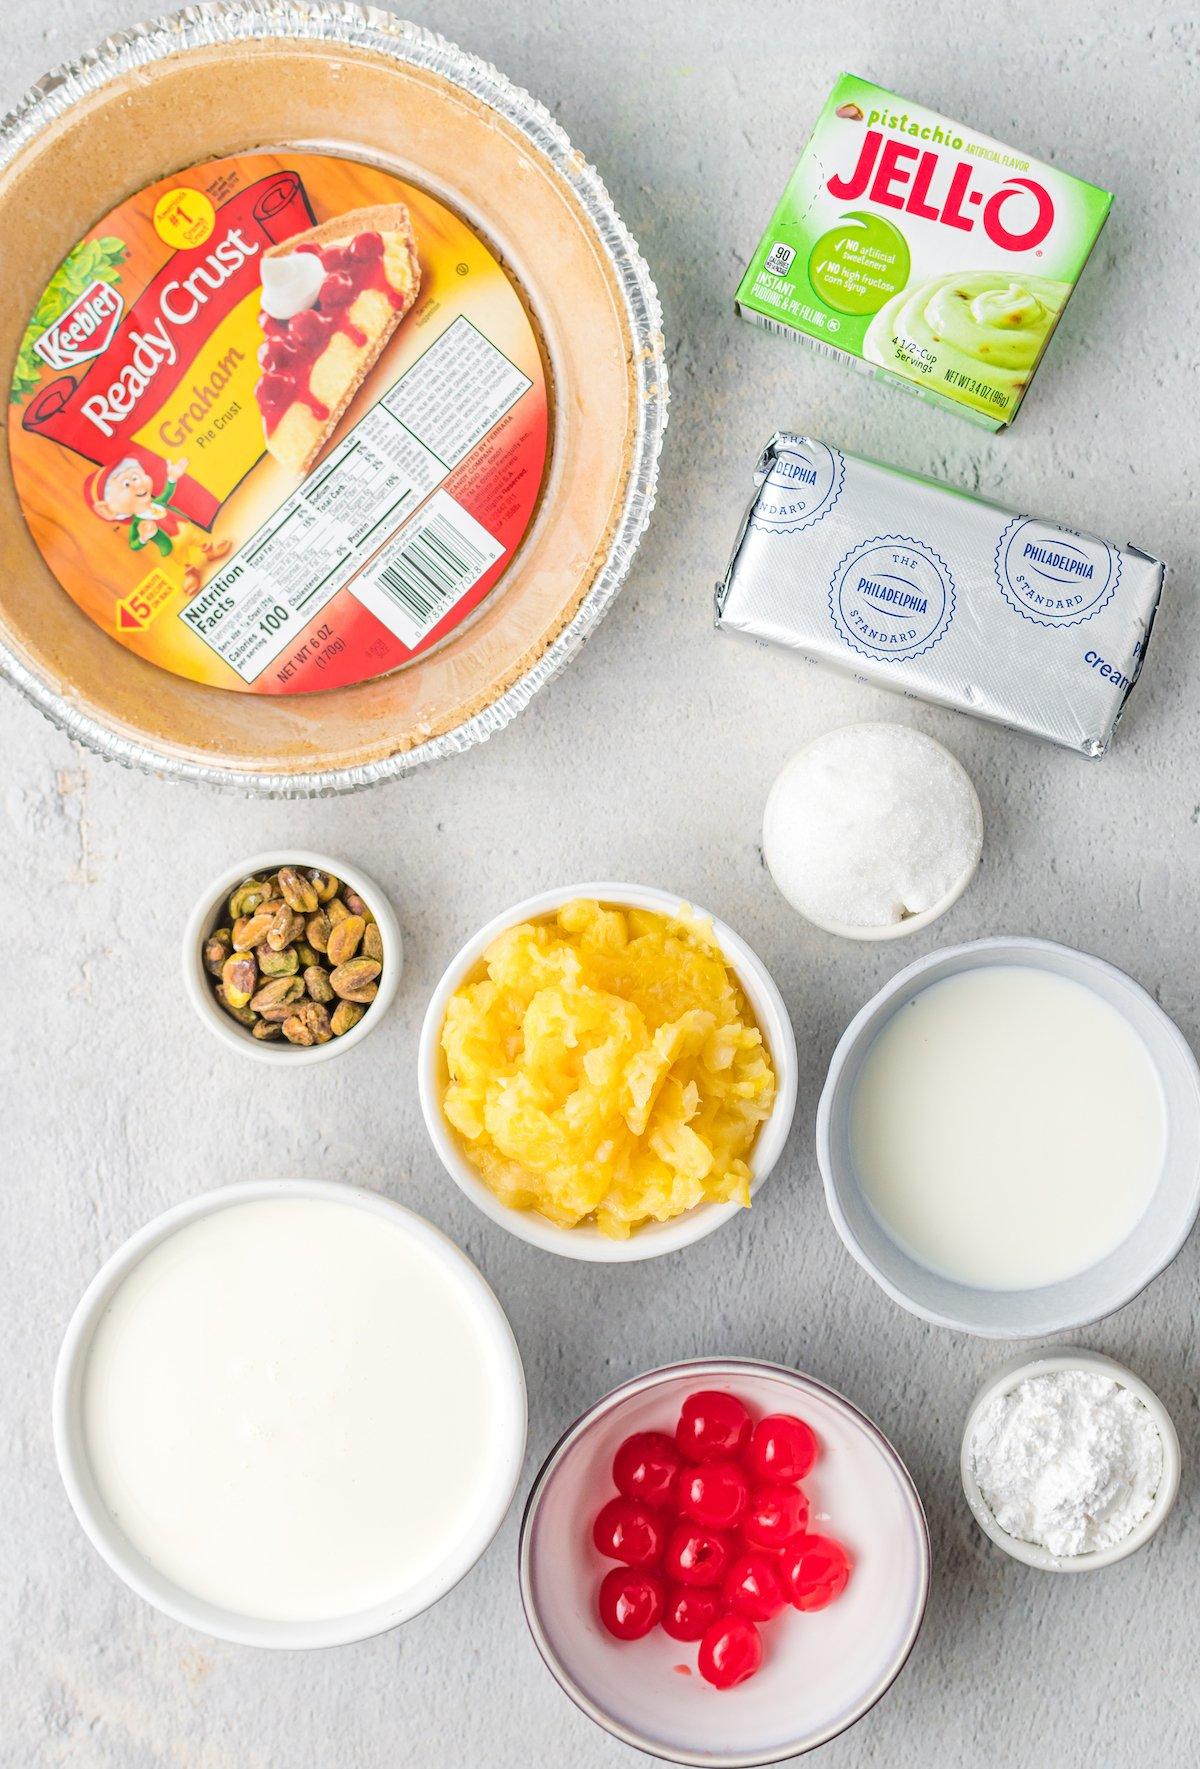 Overhead view of pie ingredients: store-bought graham cracker crust, Jello Pistachio pudding mix, cream cheese, crushed pineapple, sugar, maraschino cherries, chopped pistachios, milk, and heavy cream.